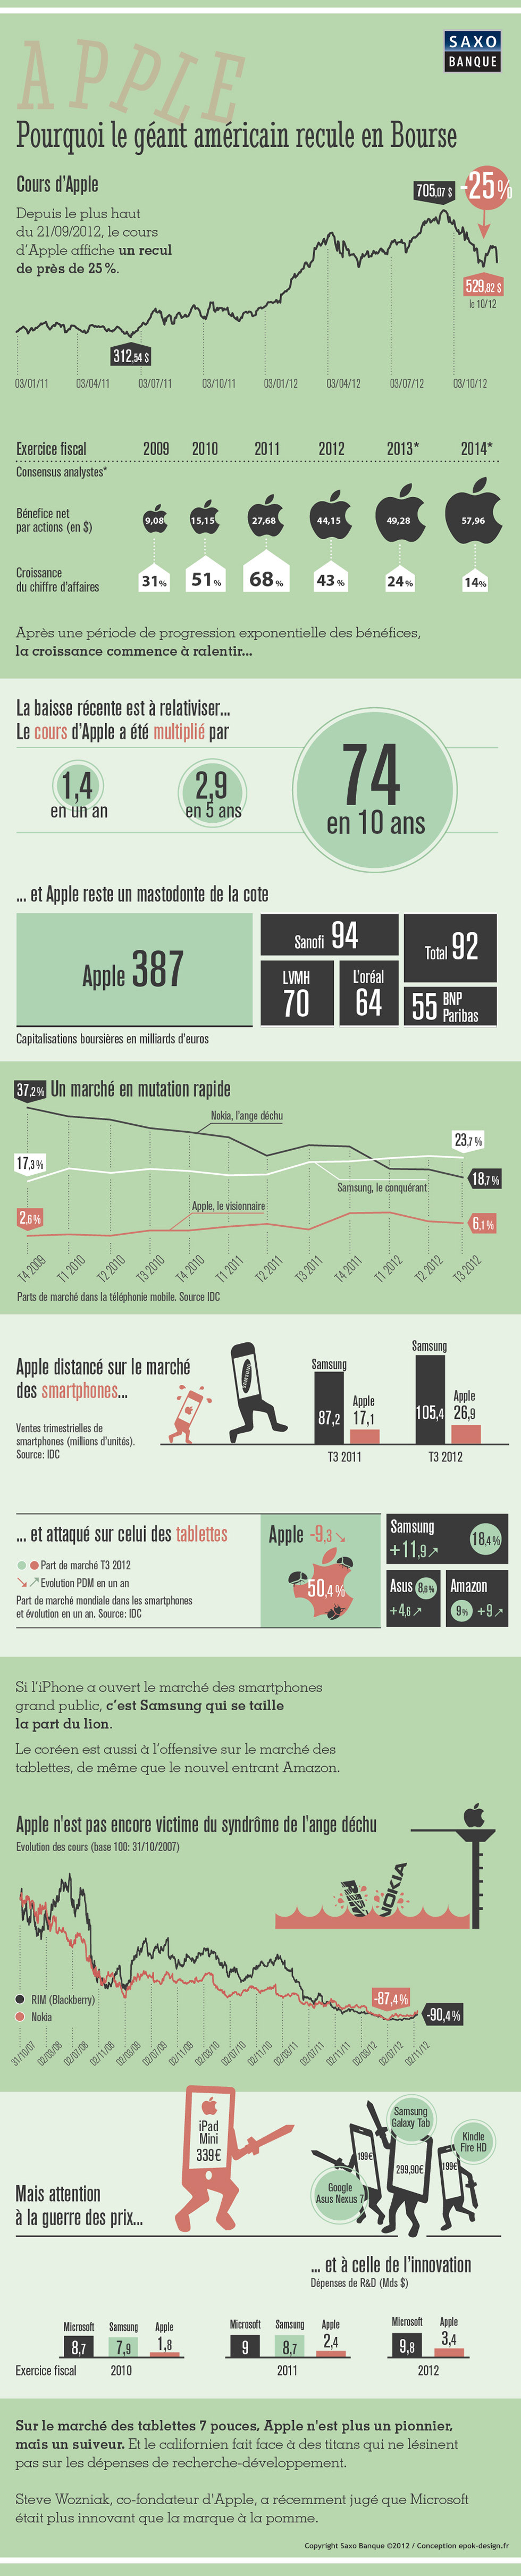 apple 2012 bilan